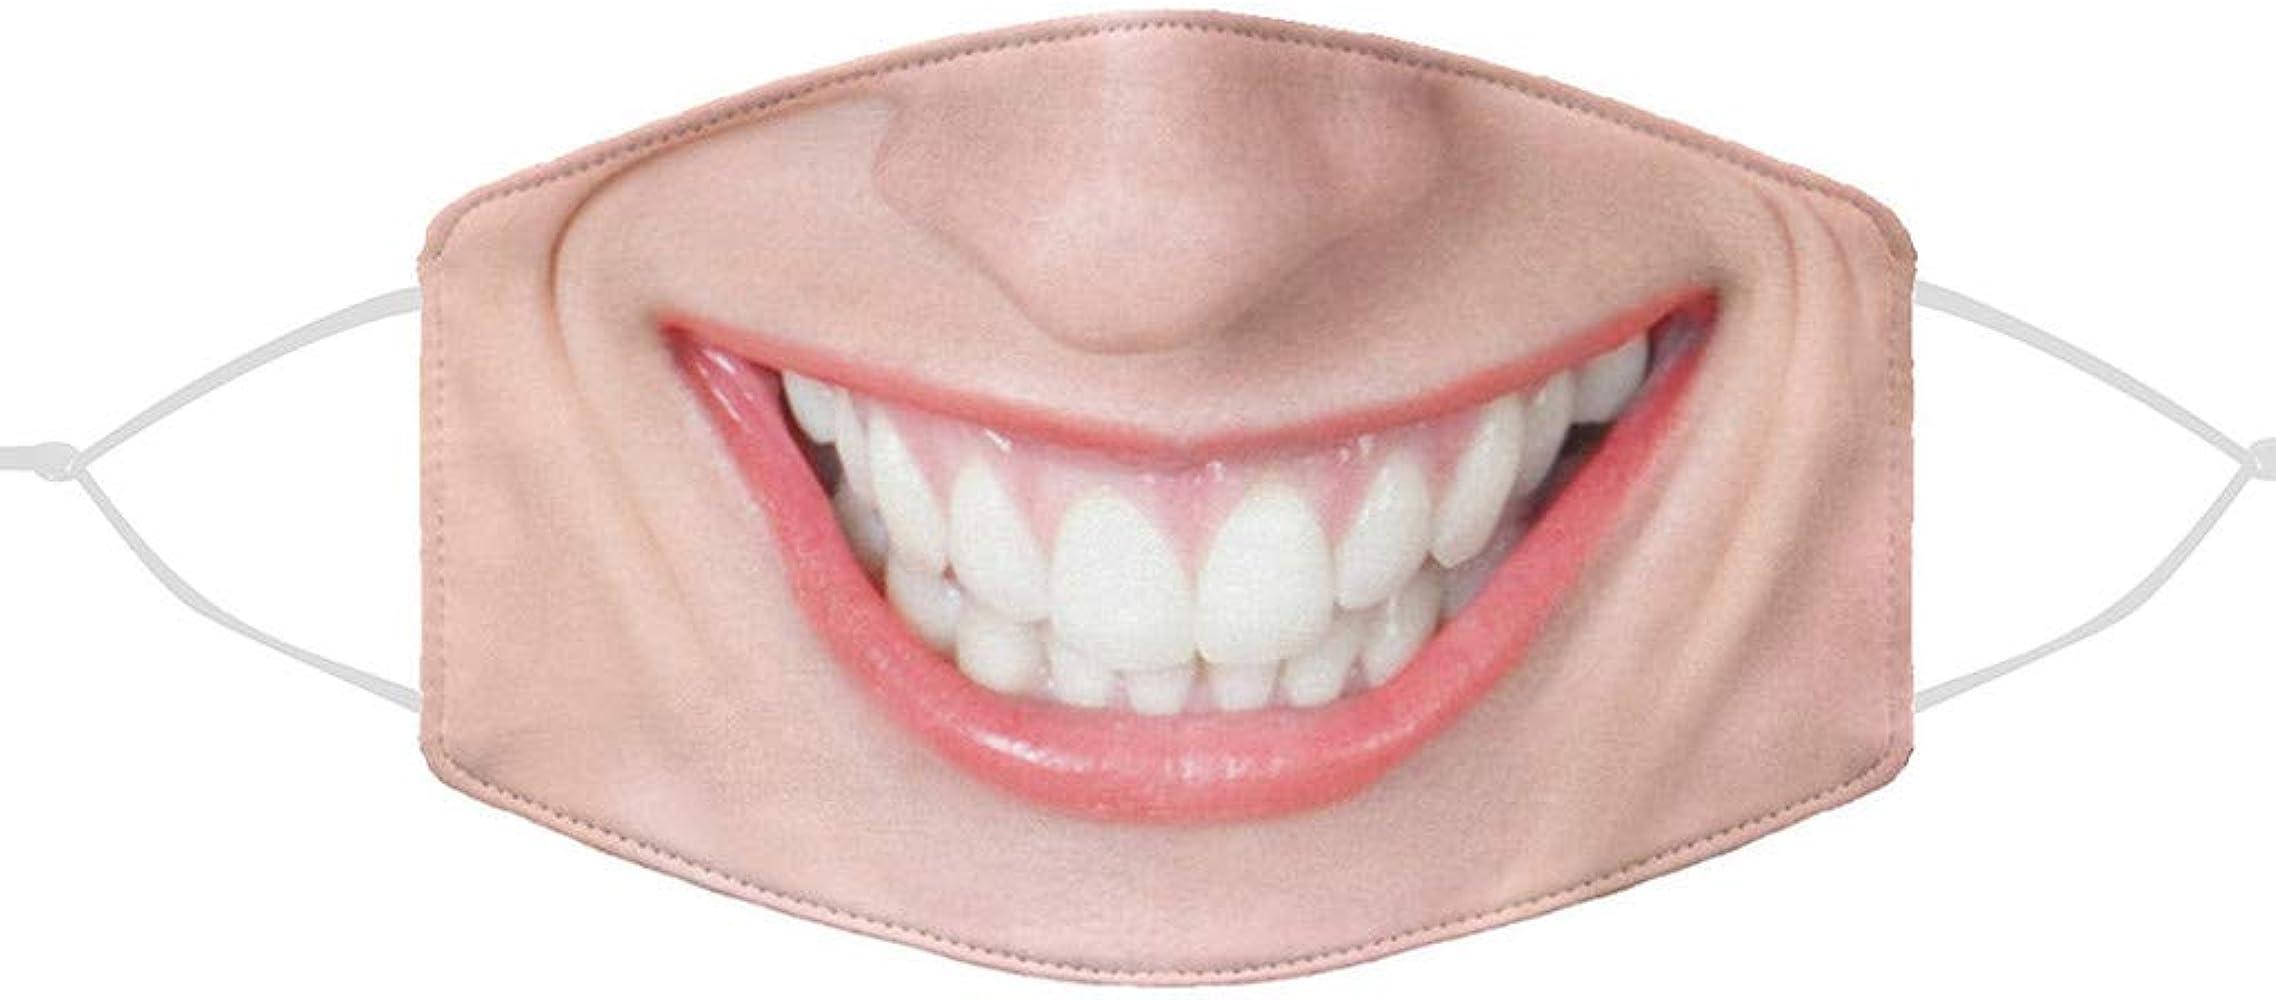 Aommy Women Anti Dust Sand PM2.5 Exhaust-Outdoor Haze Lightweight Sunscreen Face Mask Breathable Cycling Unisex Mask,for Children,Adults,Seniors,Women Beige Little White Flower